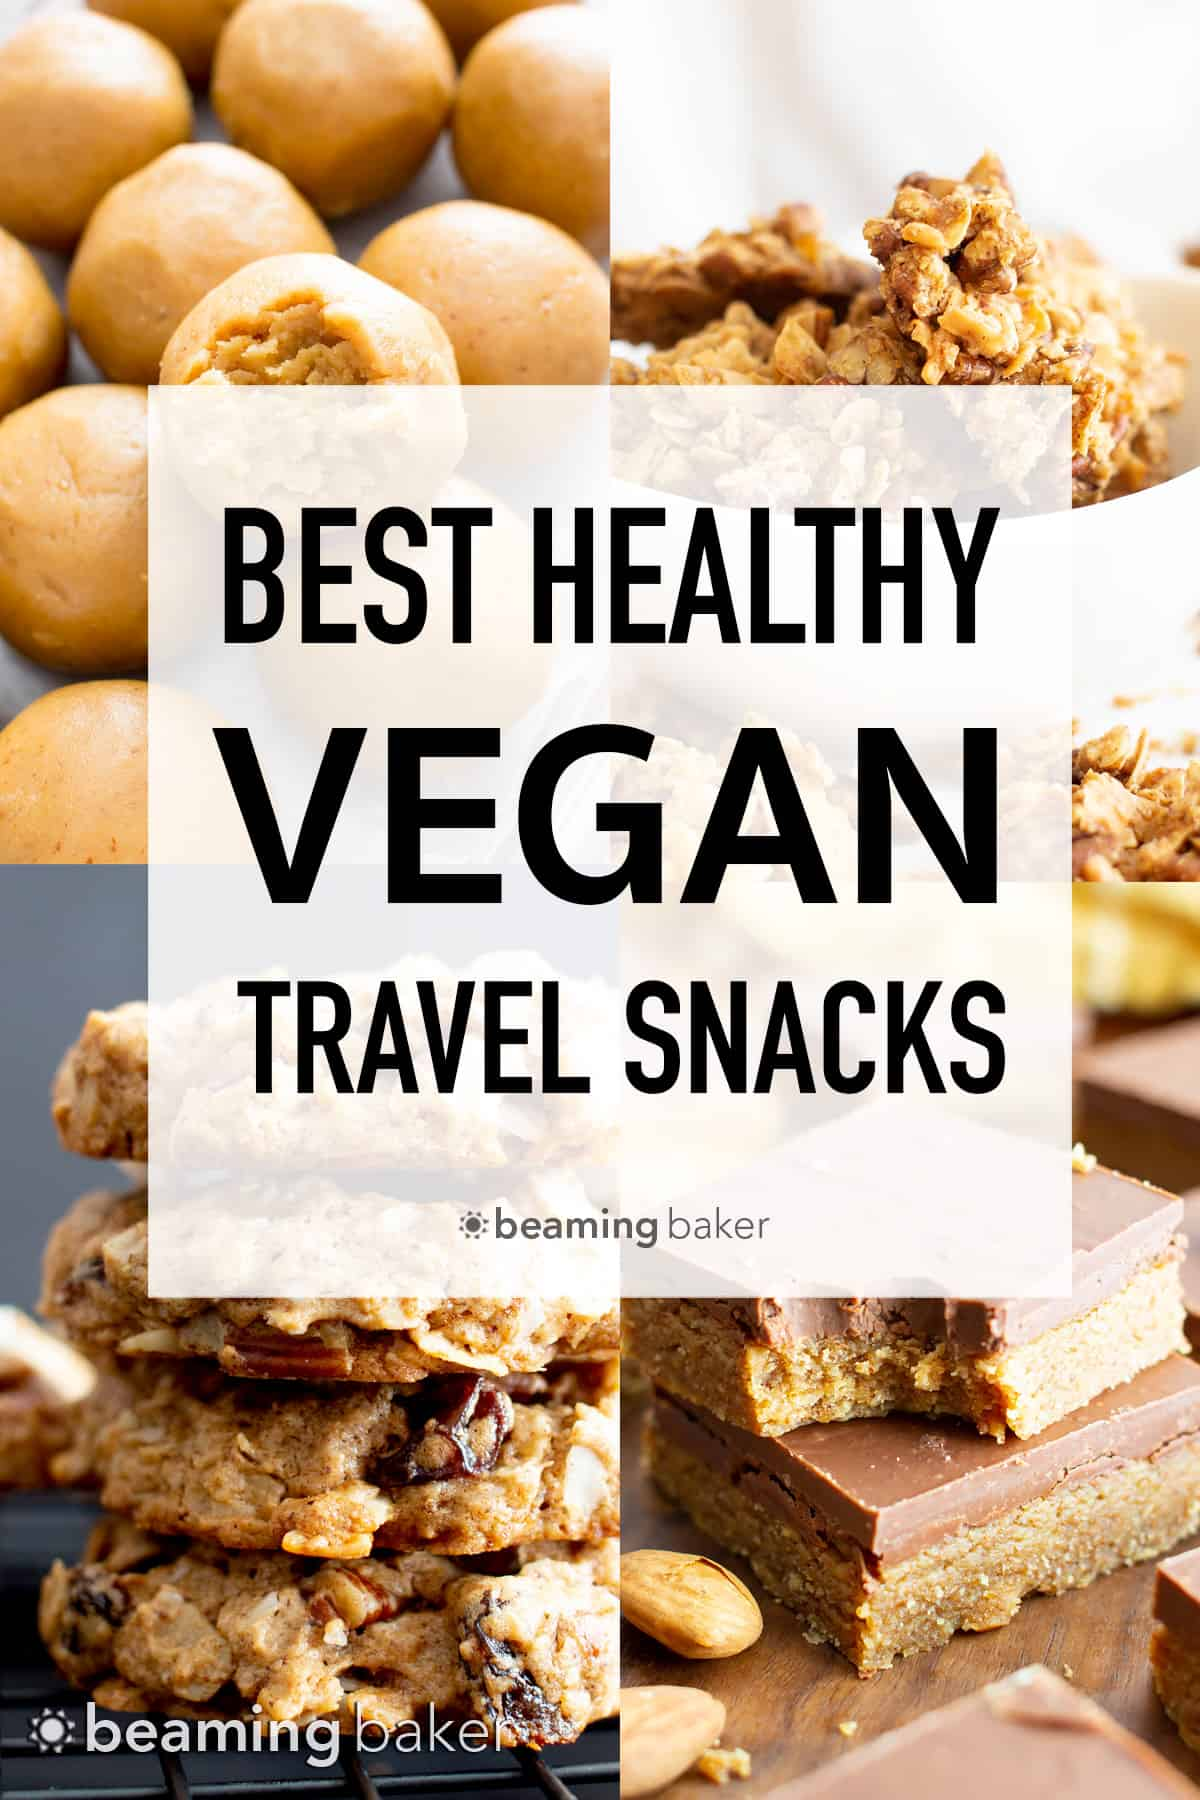 The best vegan snacks for traveling, including make-ahead no bake snacks, healthy homemade cookies, the best fruits and more vegan travel snacks! #travel #traveltips #travelhacks #travelsnacks #vegan | Post on BeamingBaker.com